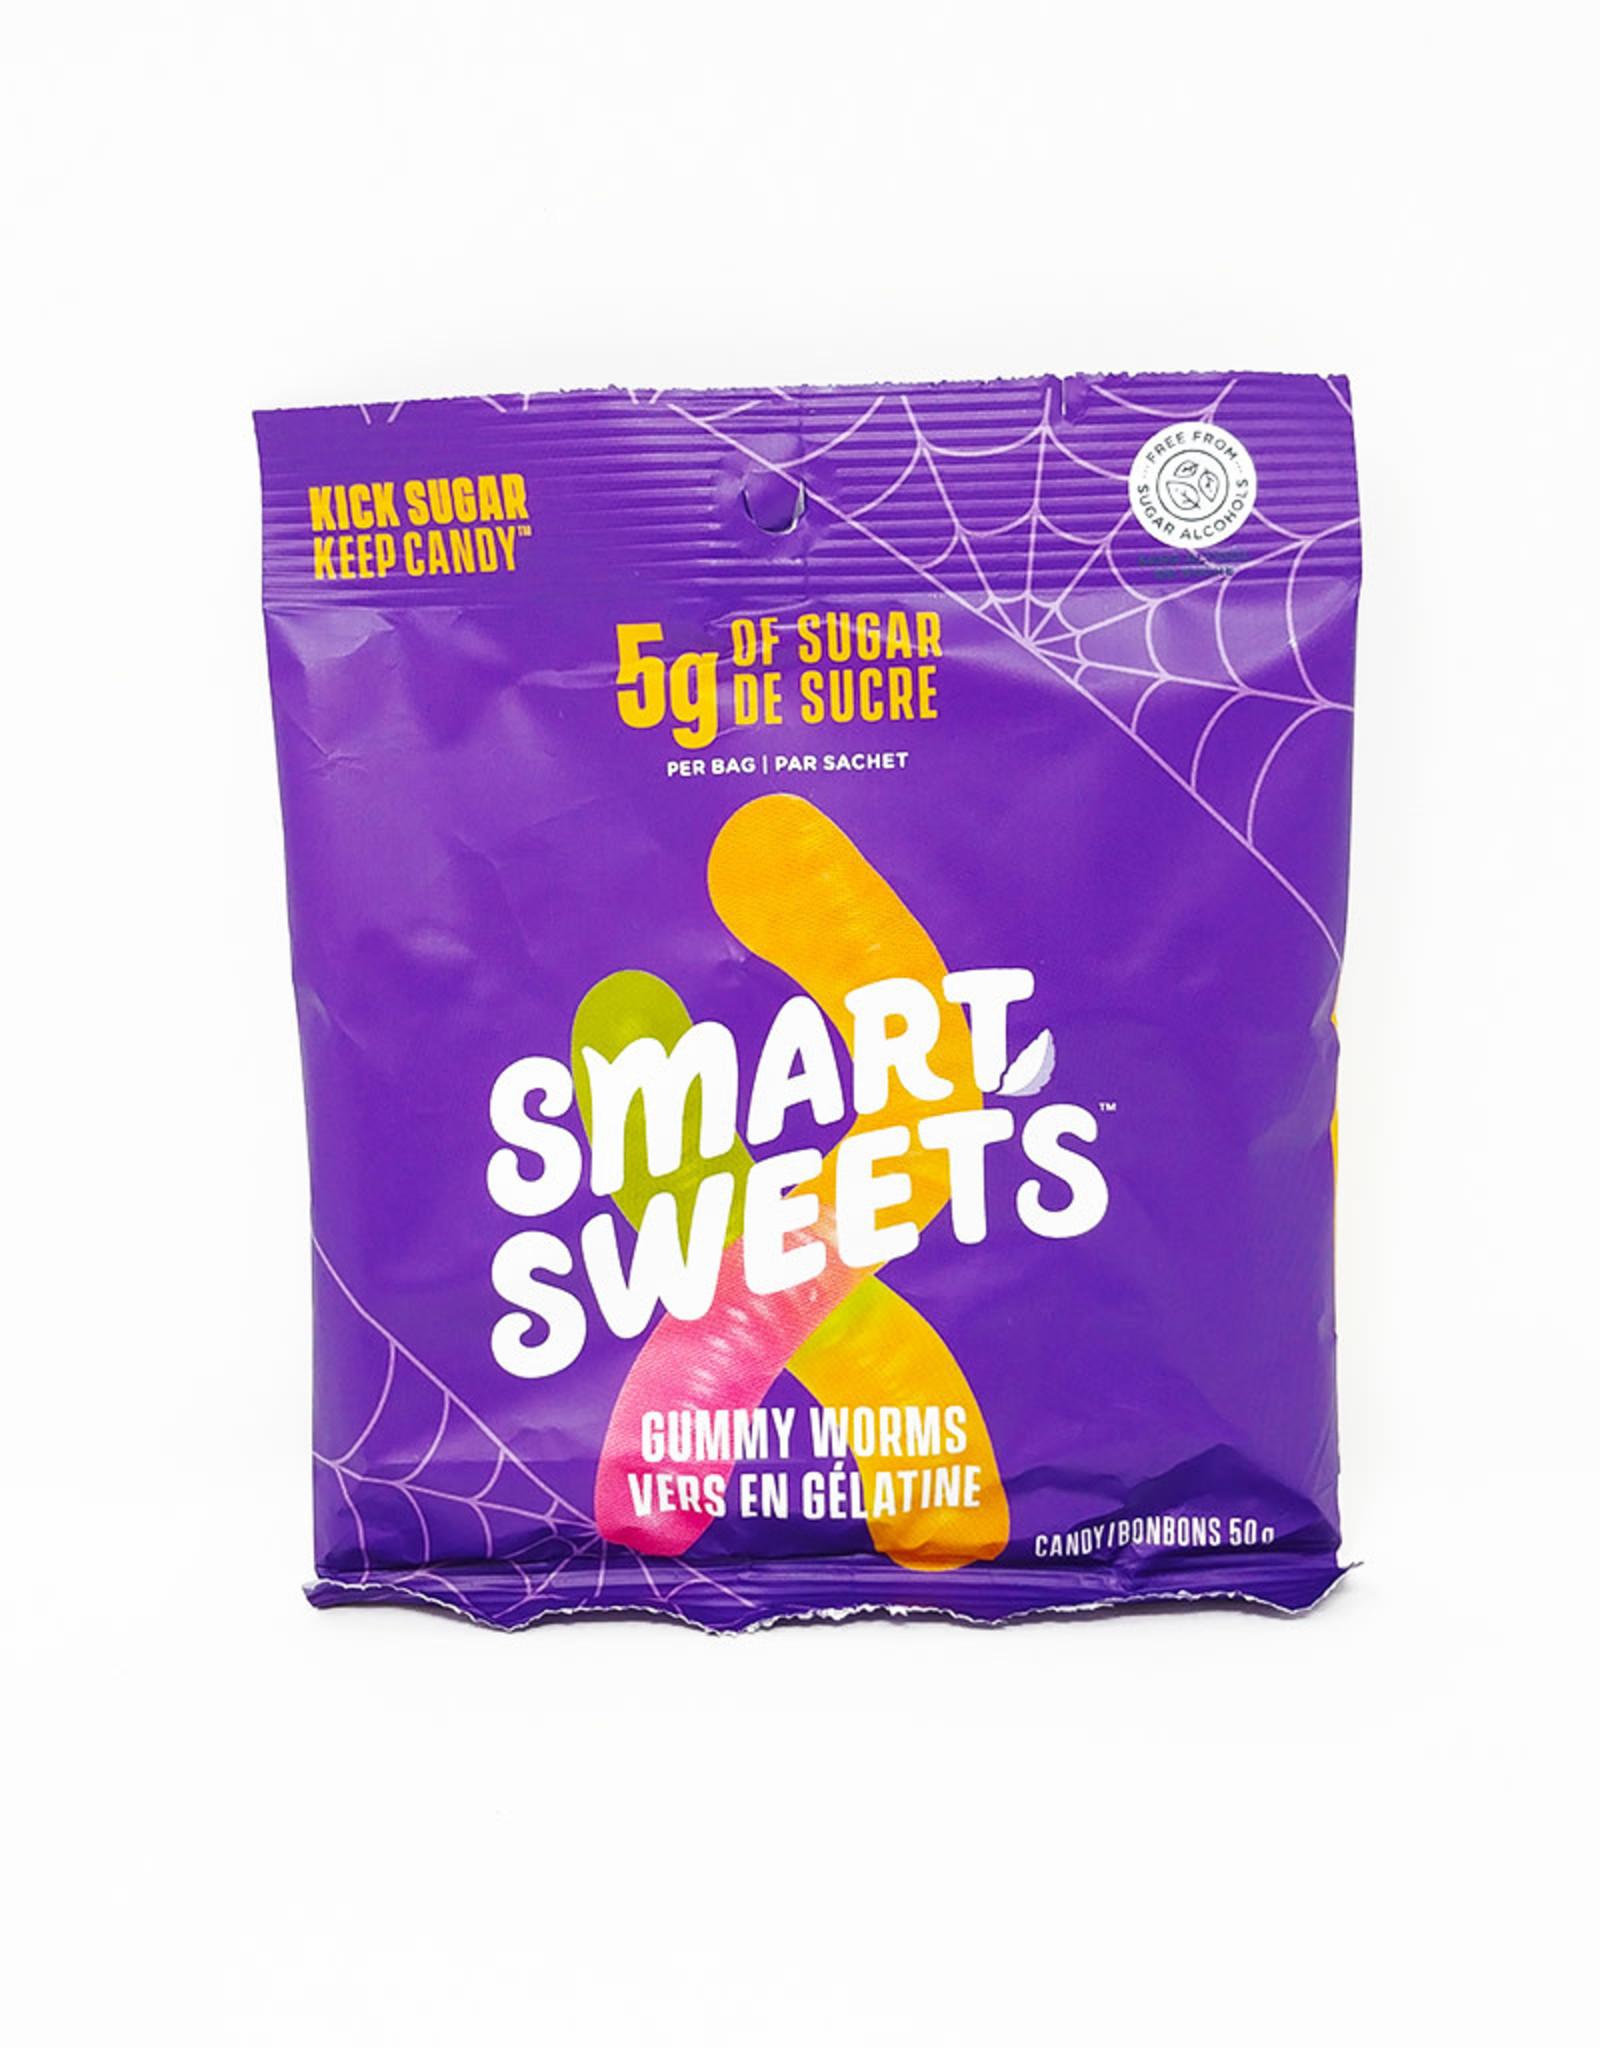 Smartsweets Smartsweets - Gummy Worms (50g)